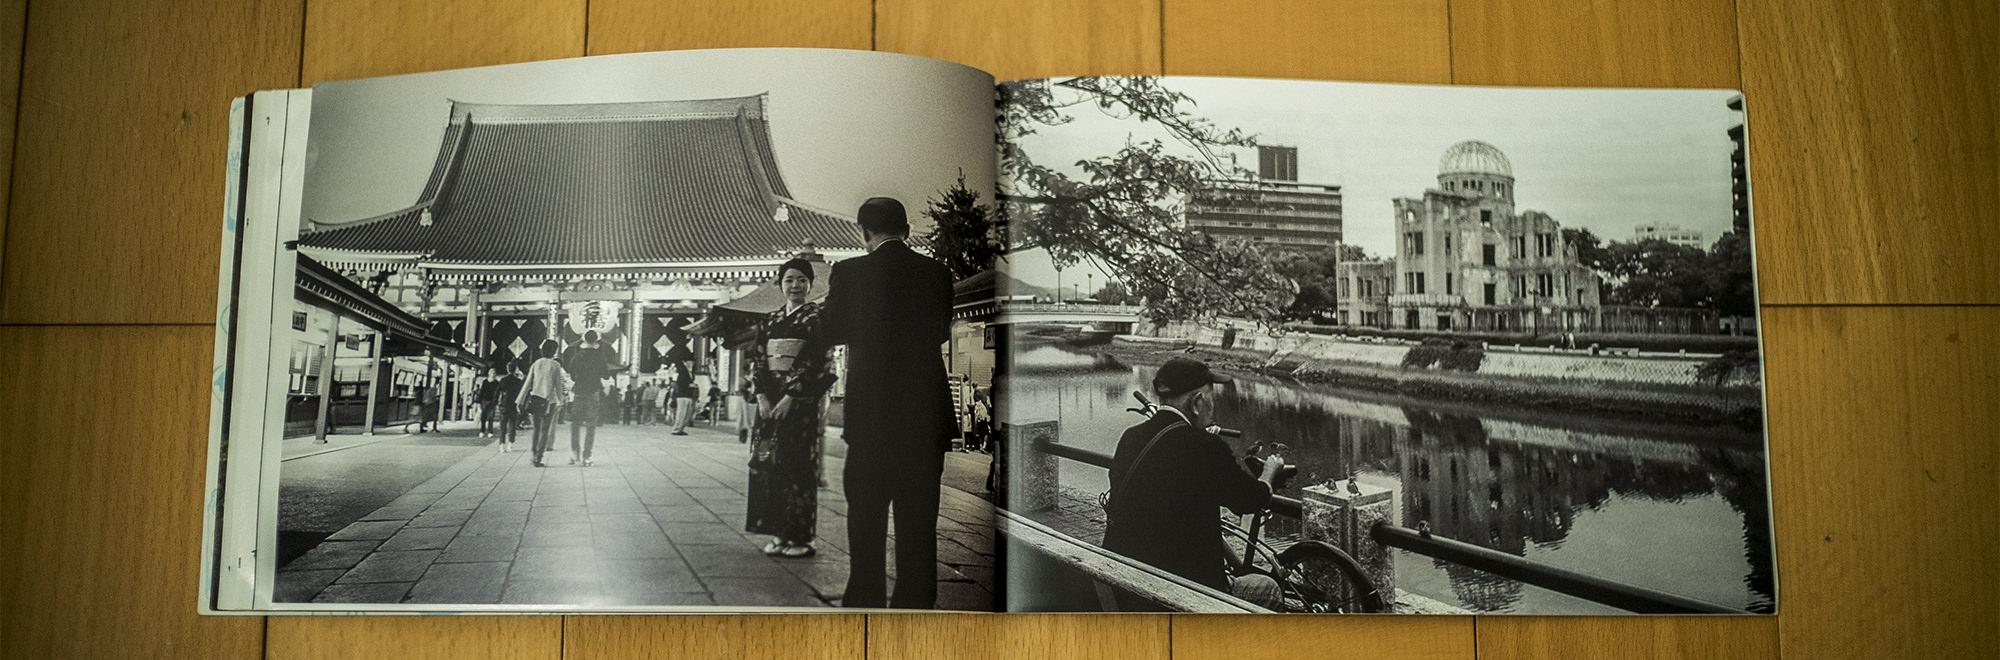 Old Friend Japan Page 13 LOWQ